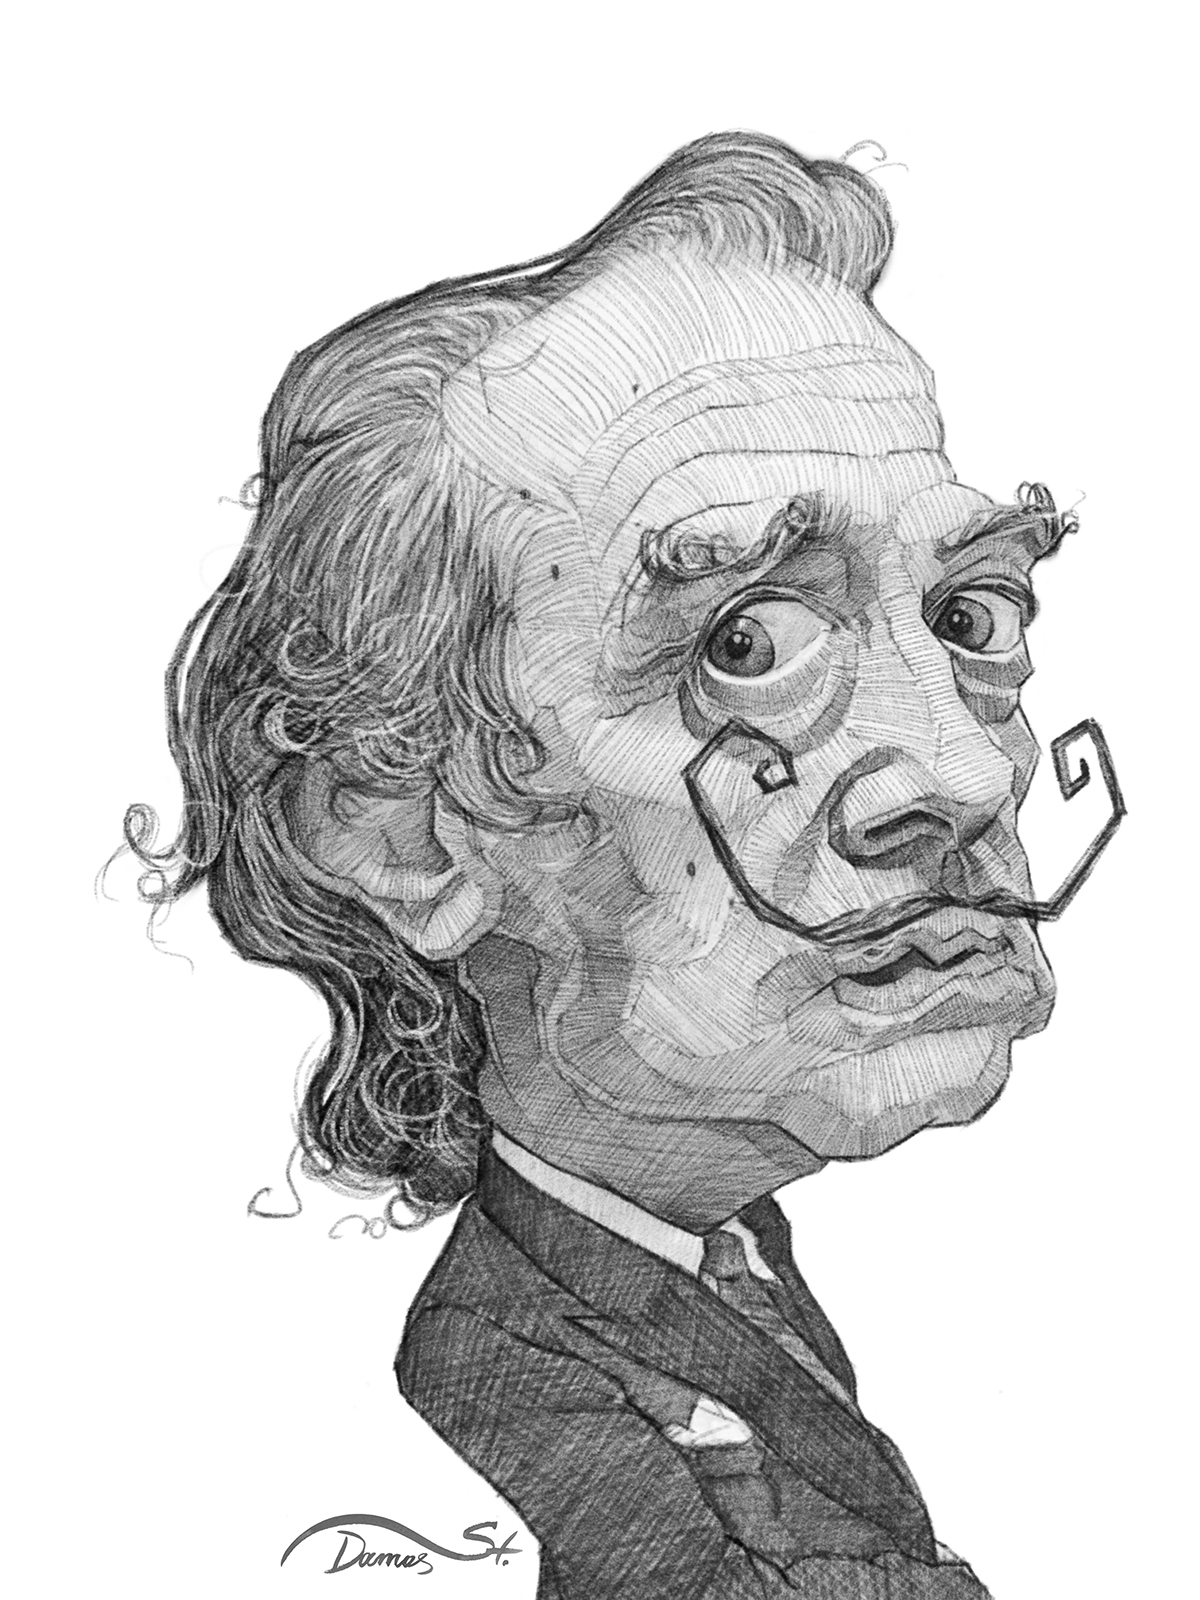 cartoon caricature   portrait face editorial Fun funny dali painter famous b&w art artistic spain sketch